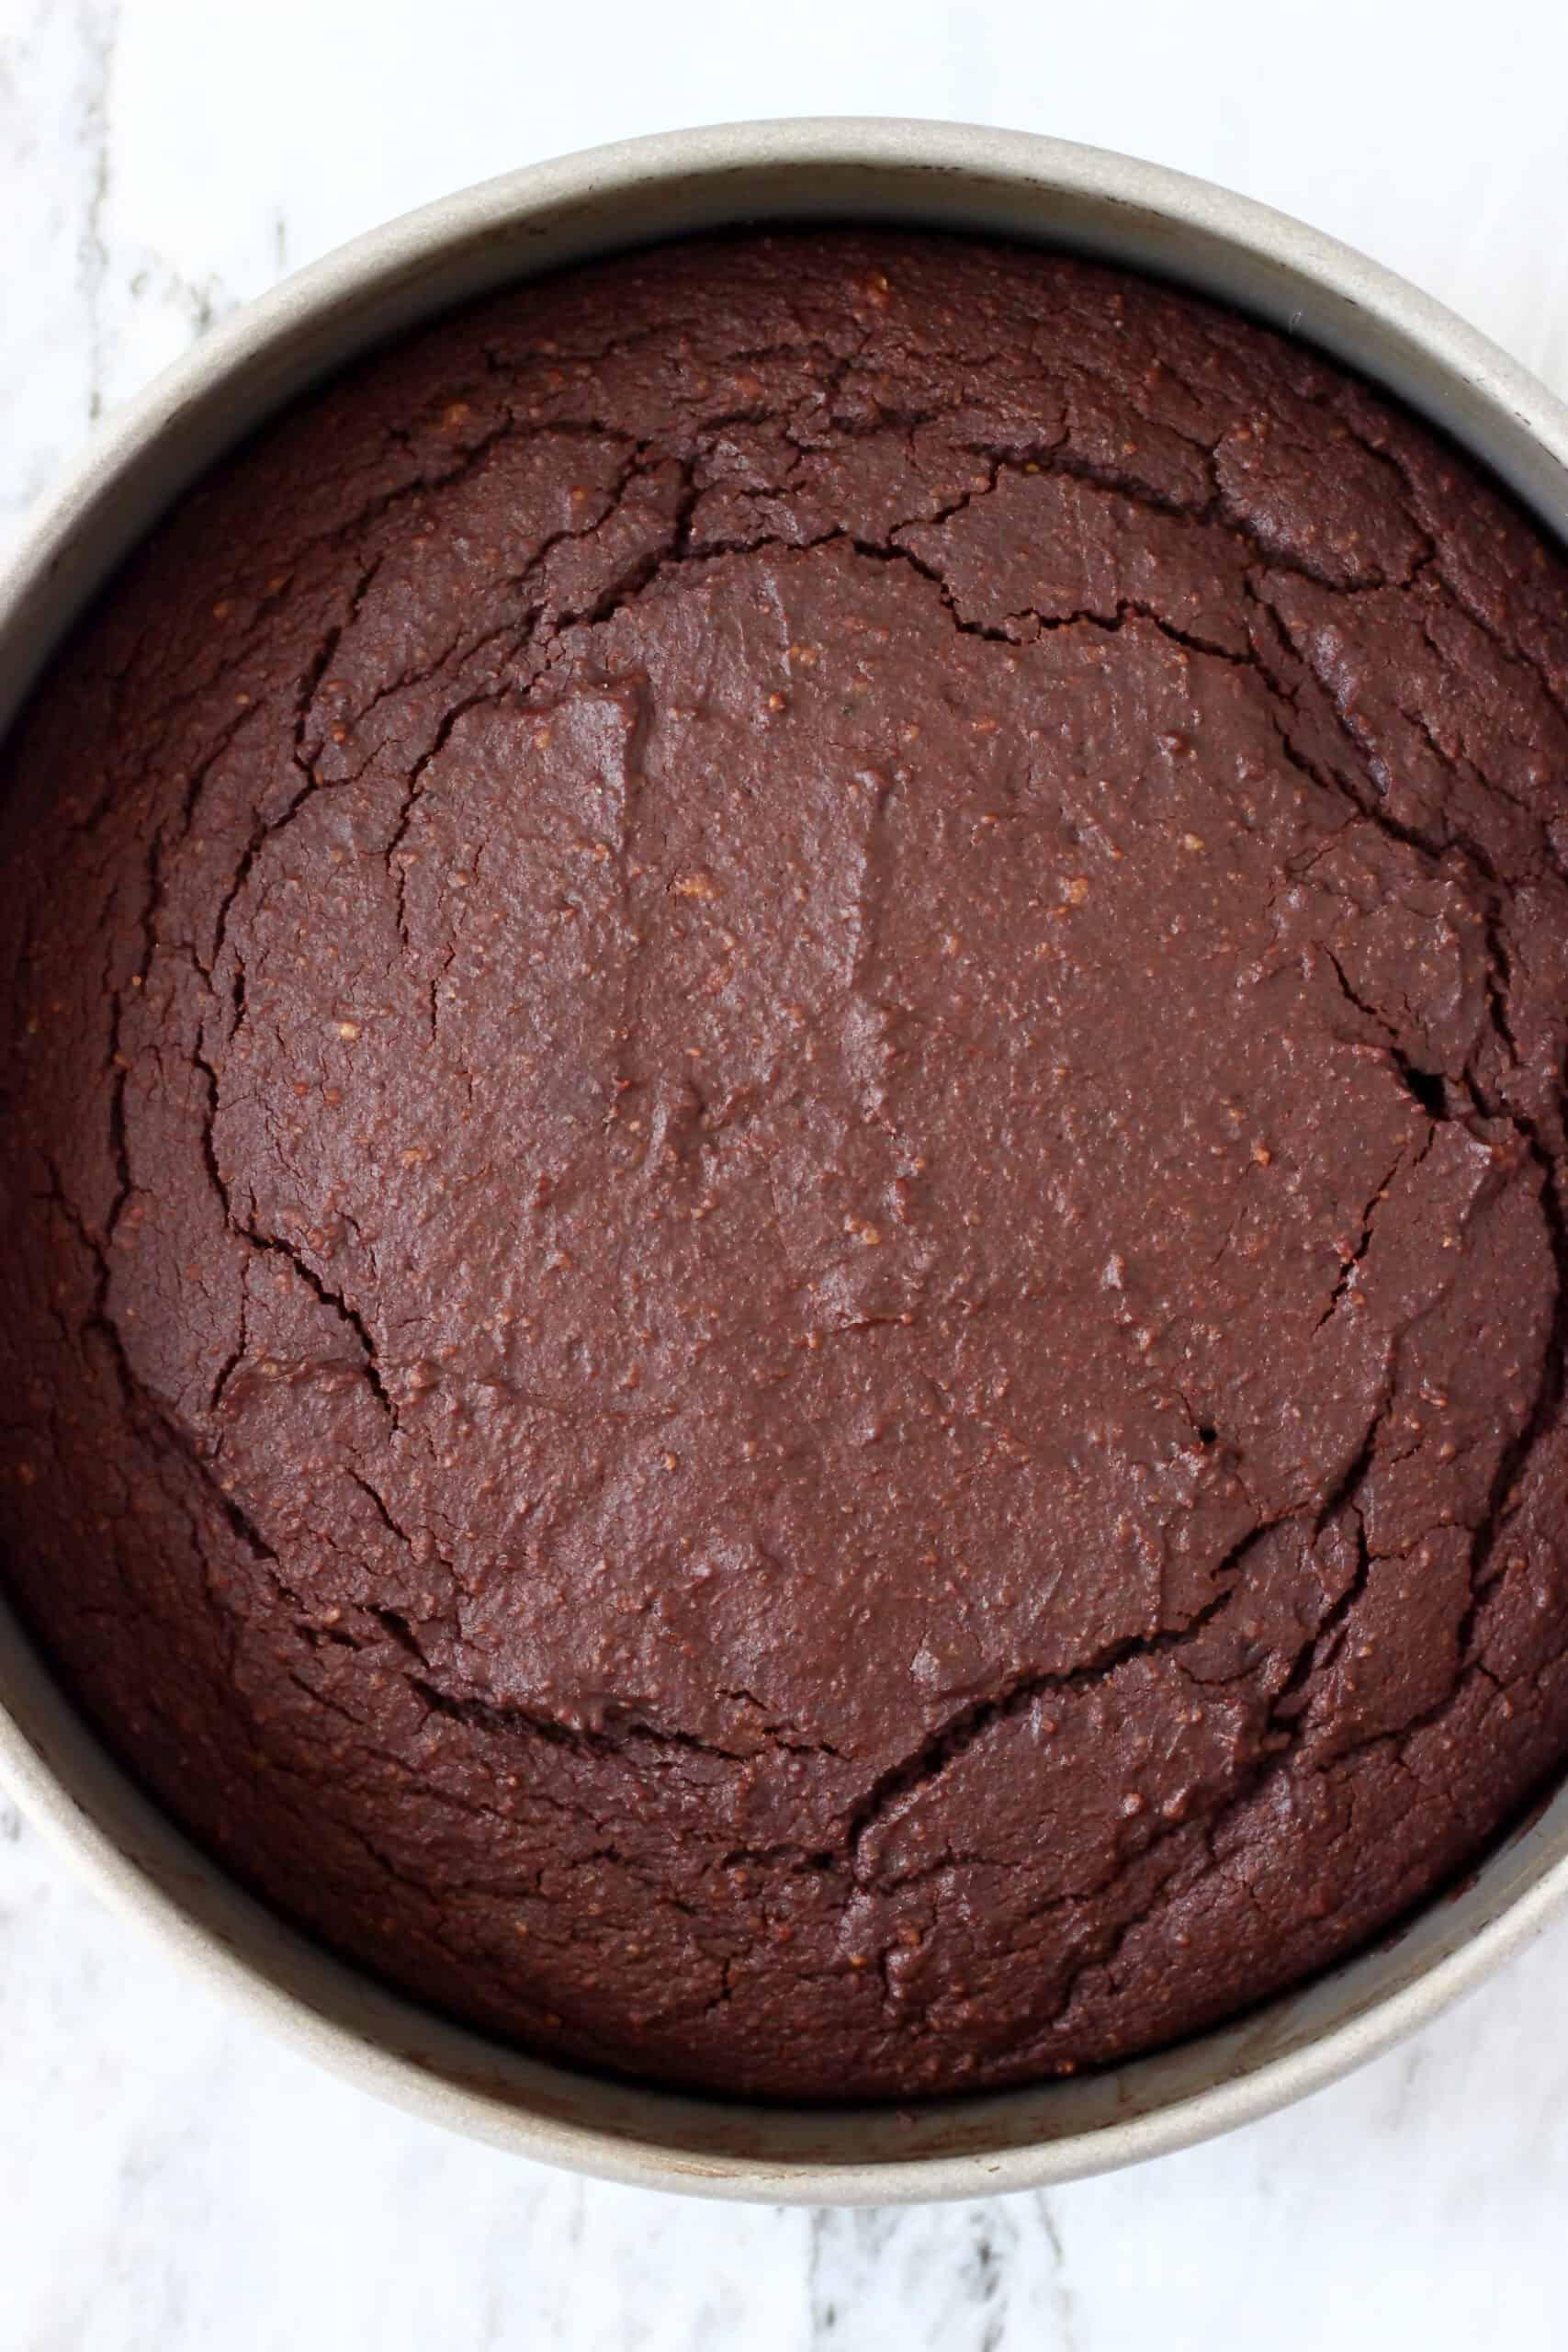 Gluten-free vegan chocolate mousse cake sponge in a springform baking tin